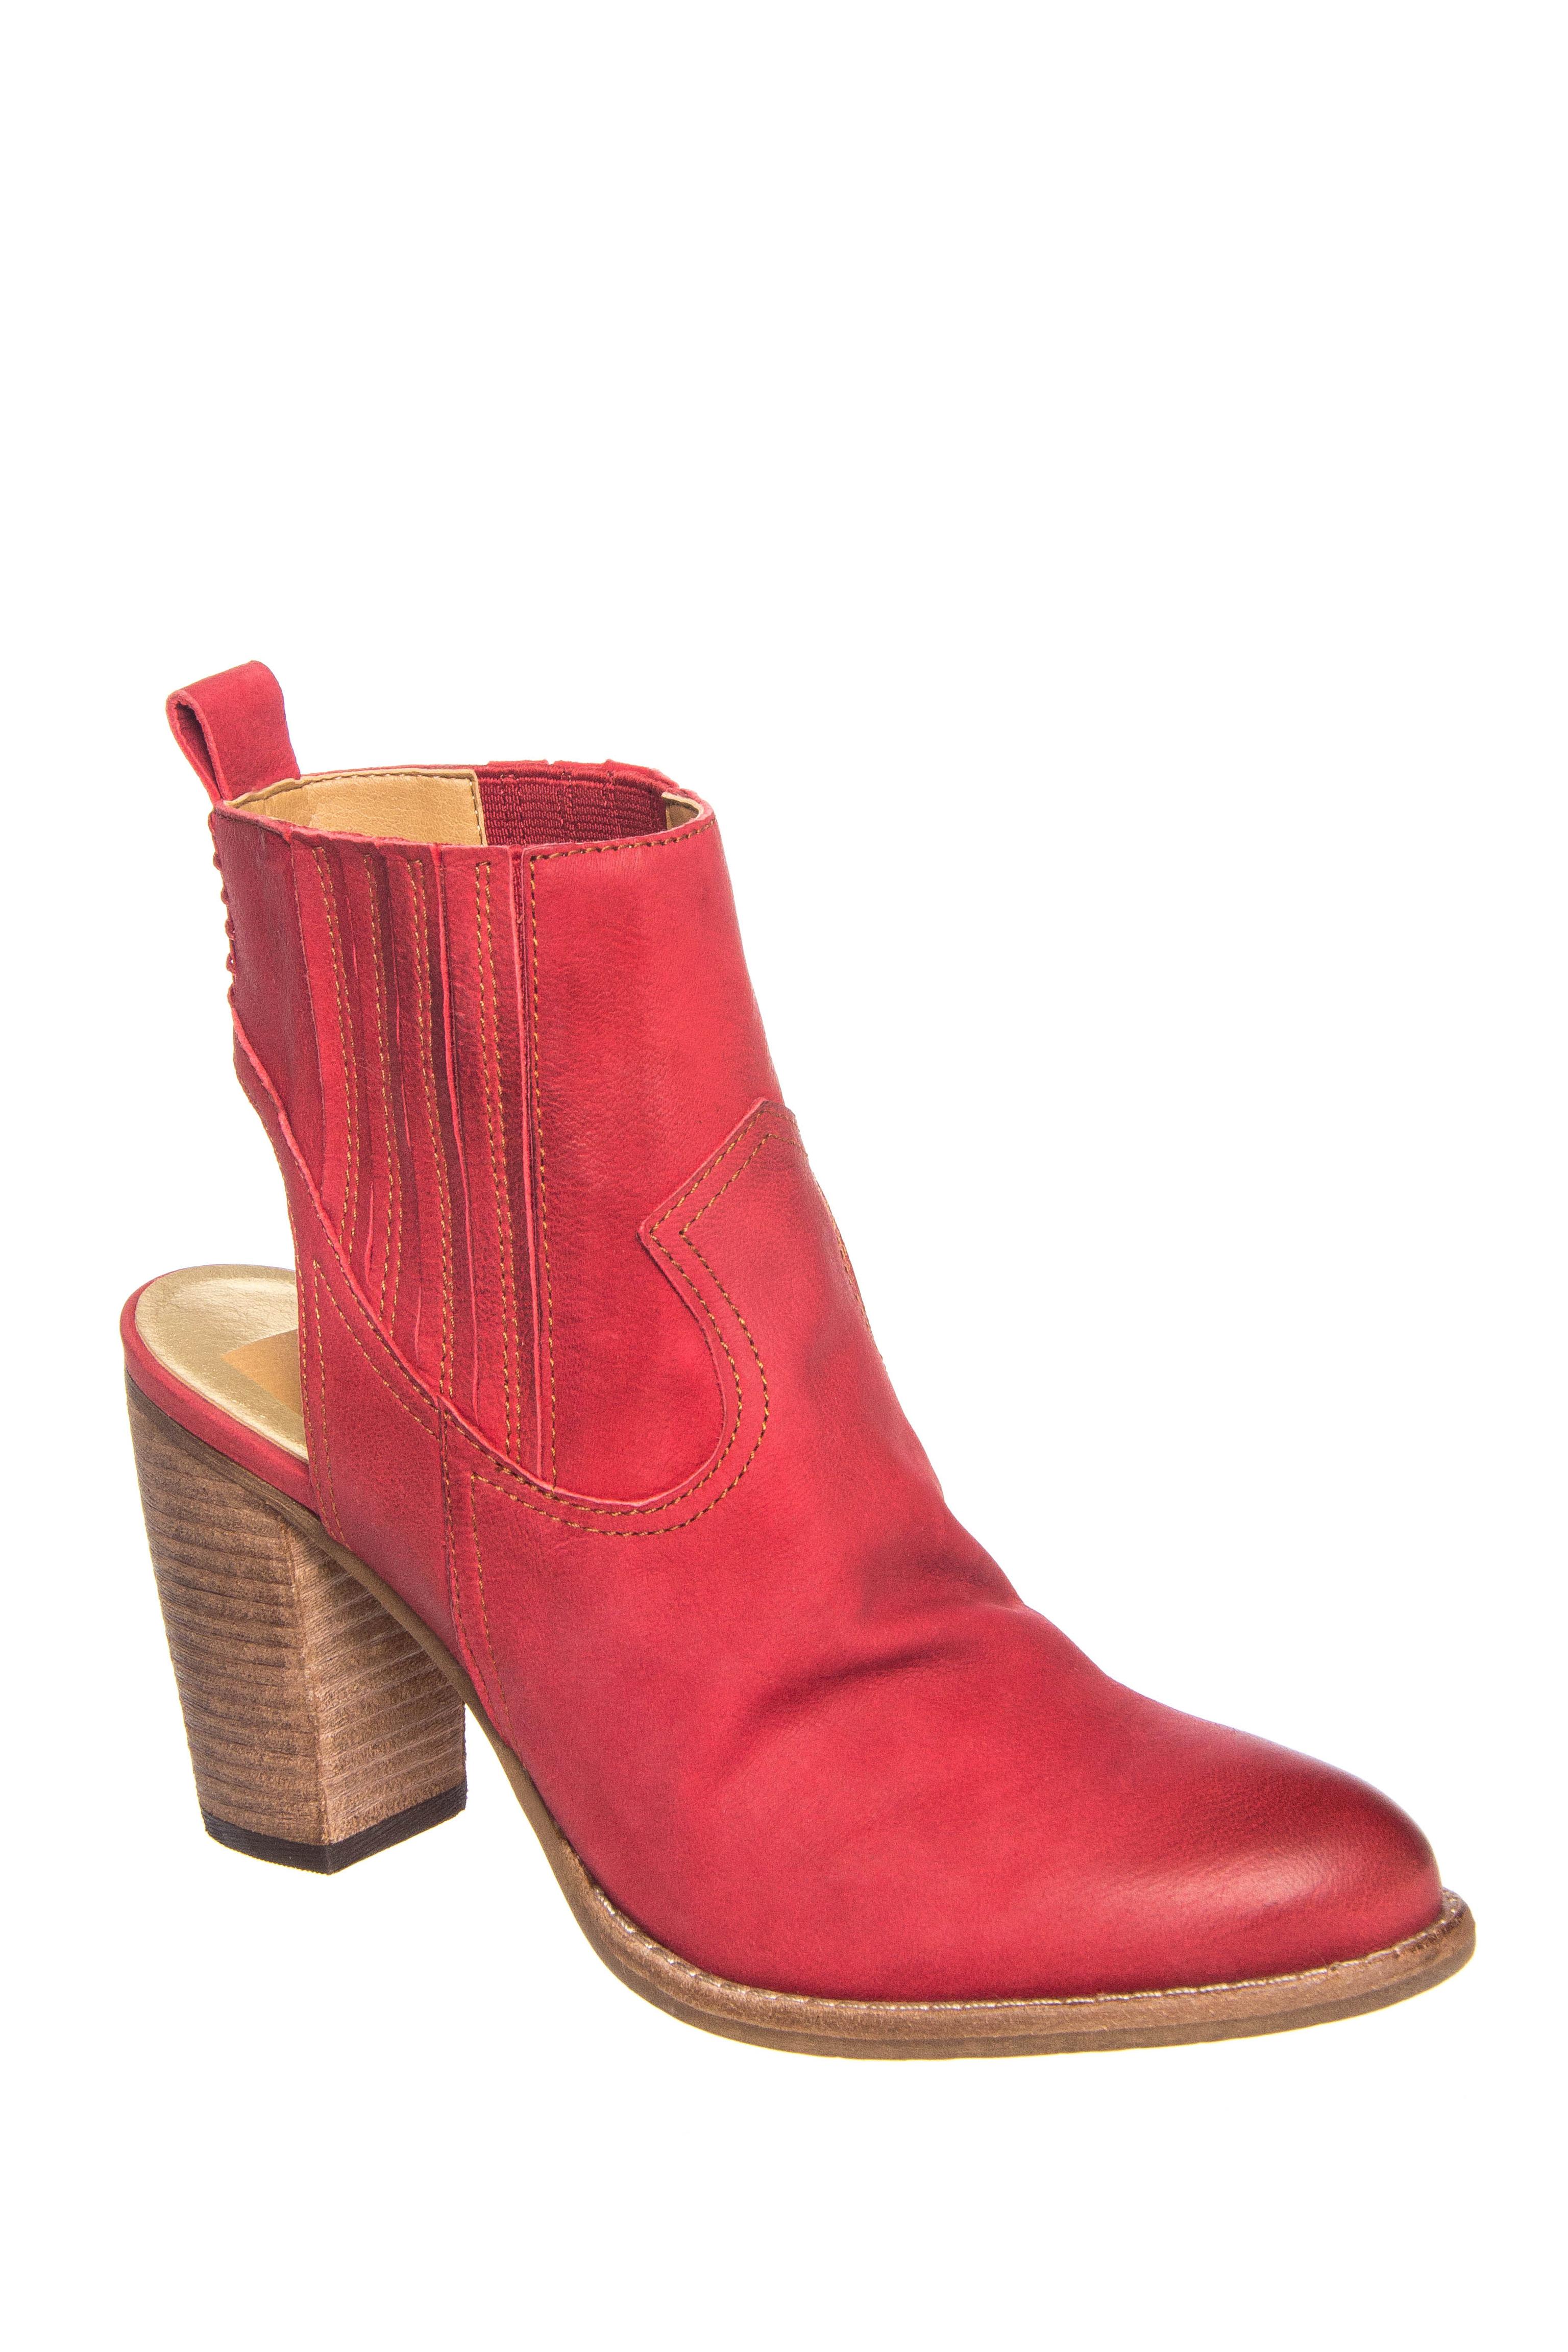 Dolce Vita Jasper High Heel Booties